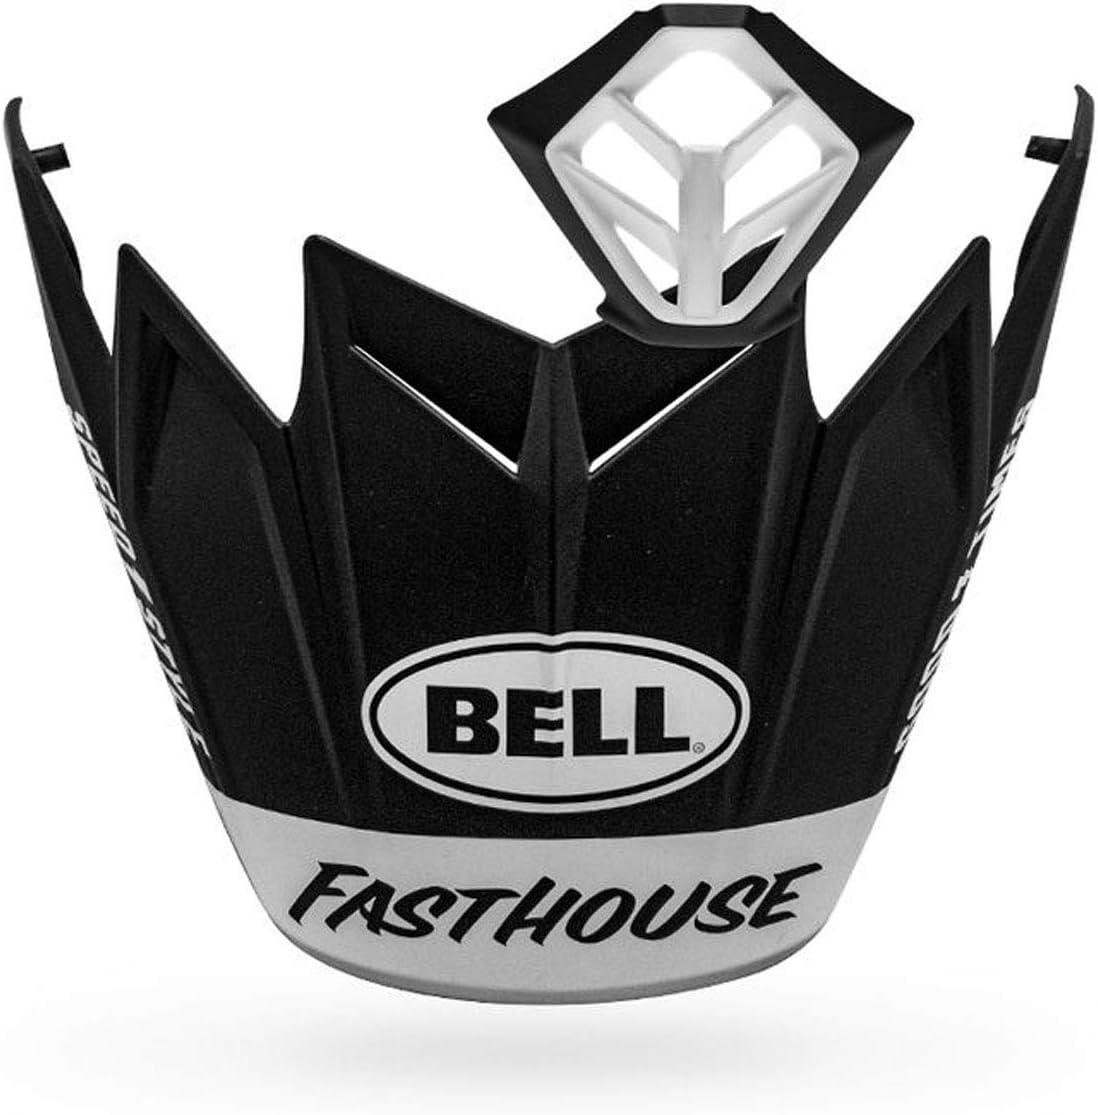 BELL Moto-9 Visor Mouthpiece Kit Sale item free Motorcycle Acce Helmet Off-Road